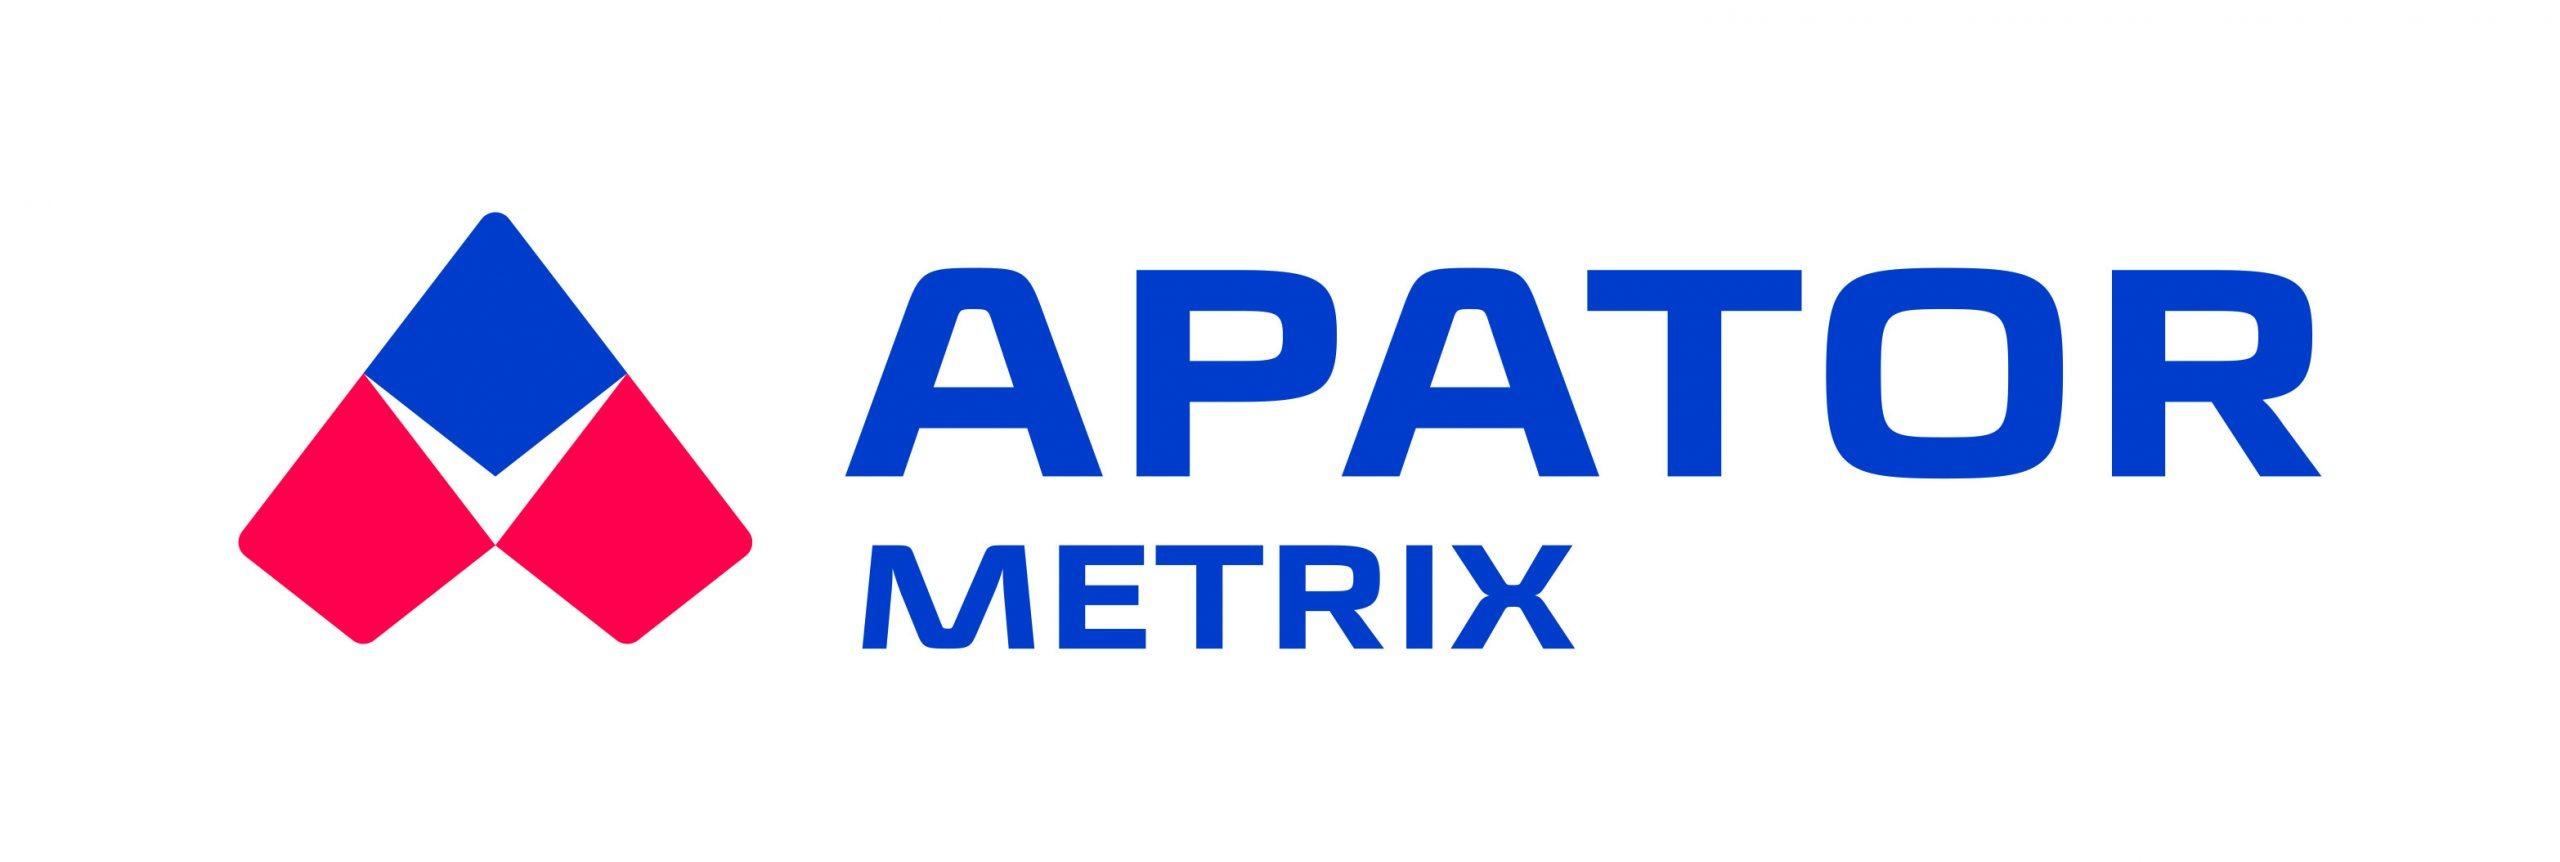 APATOR MEXTRIX Meters